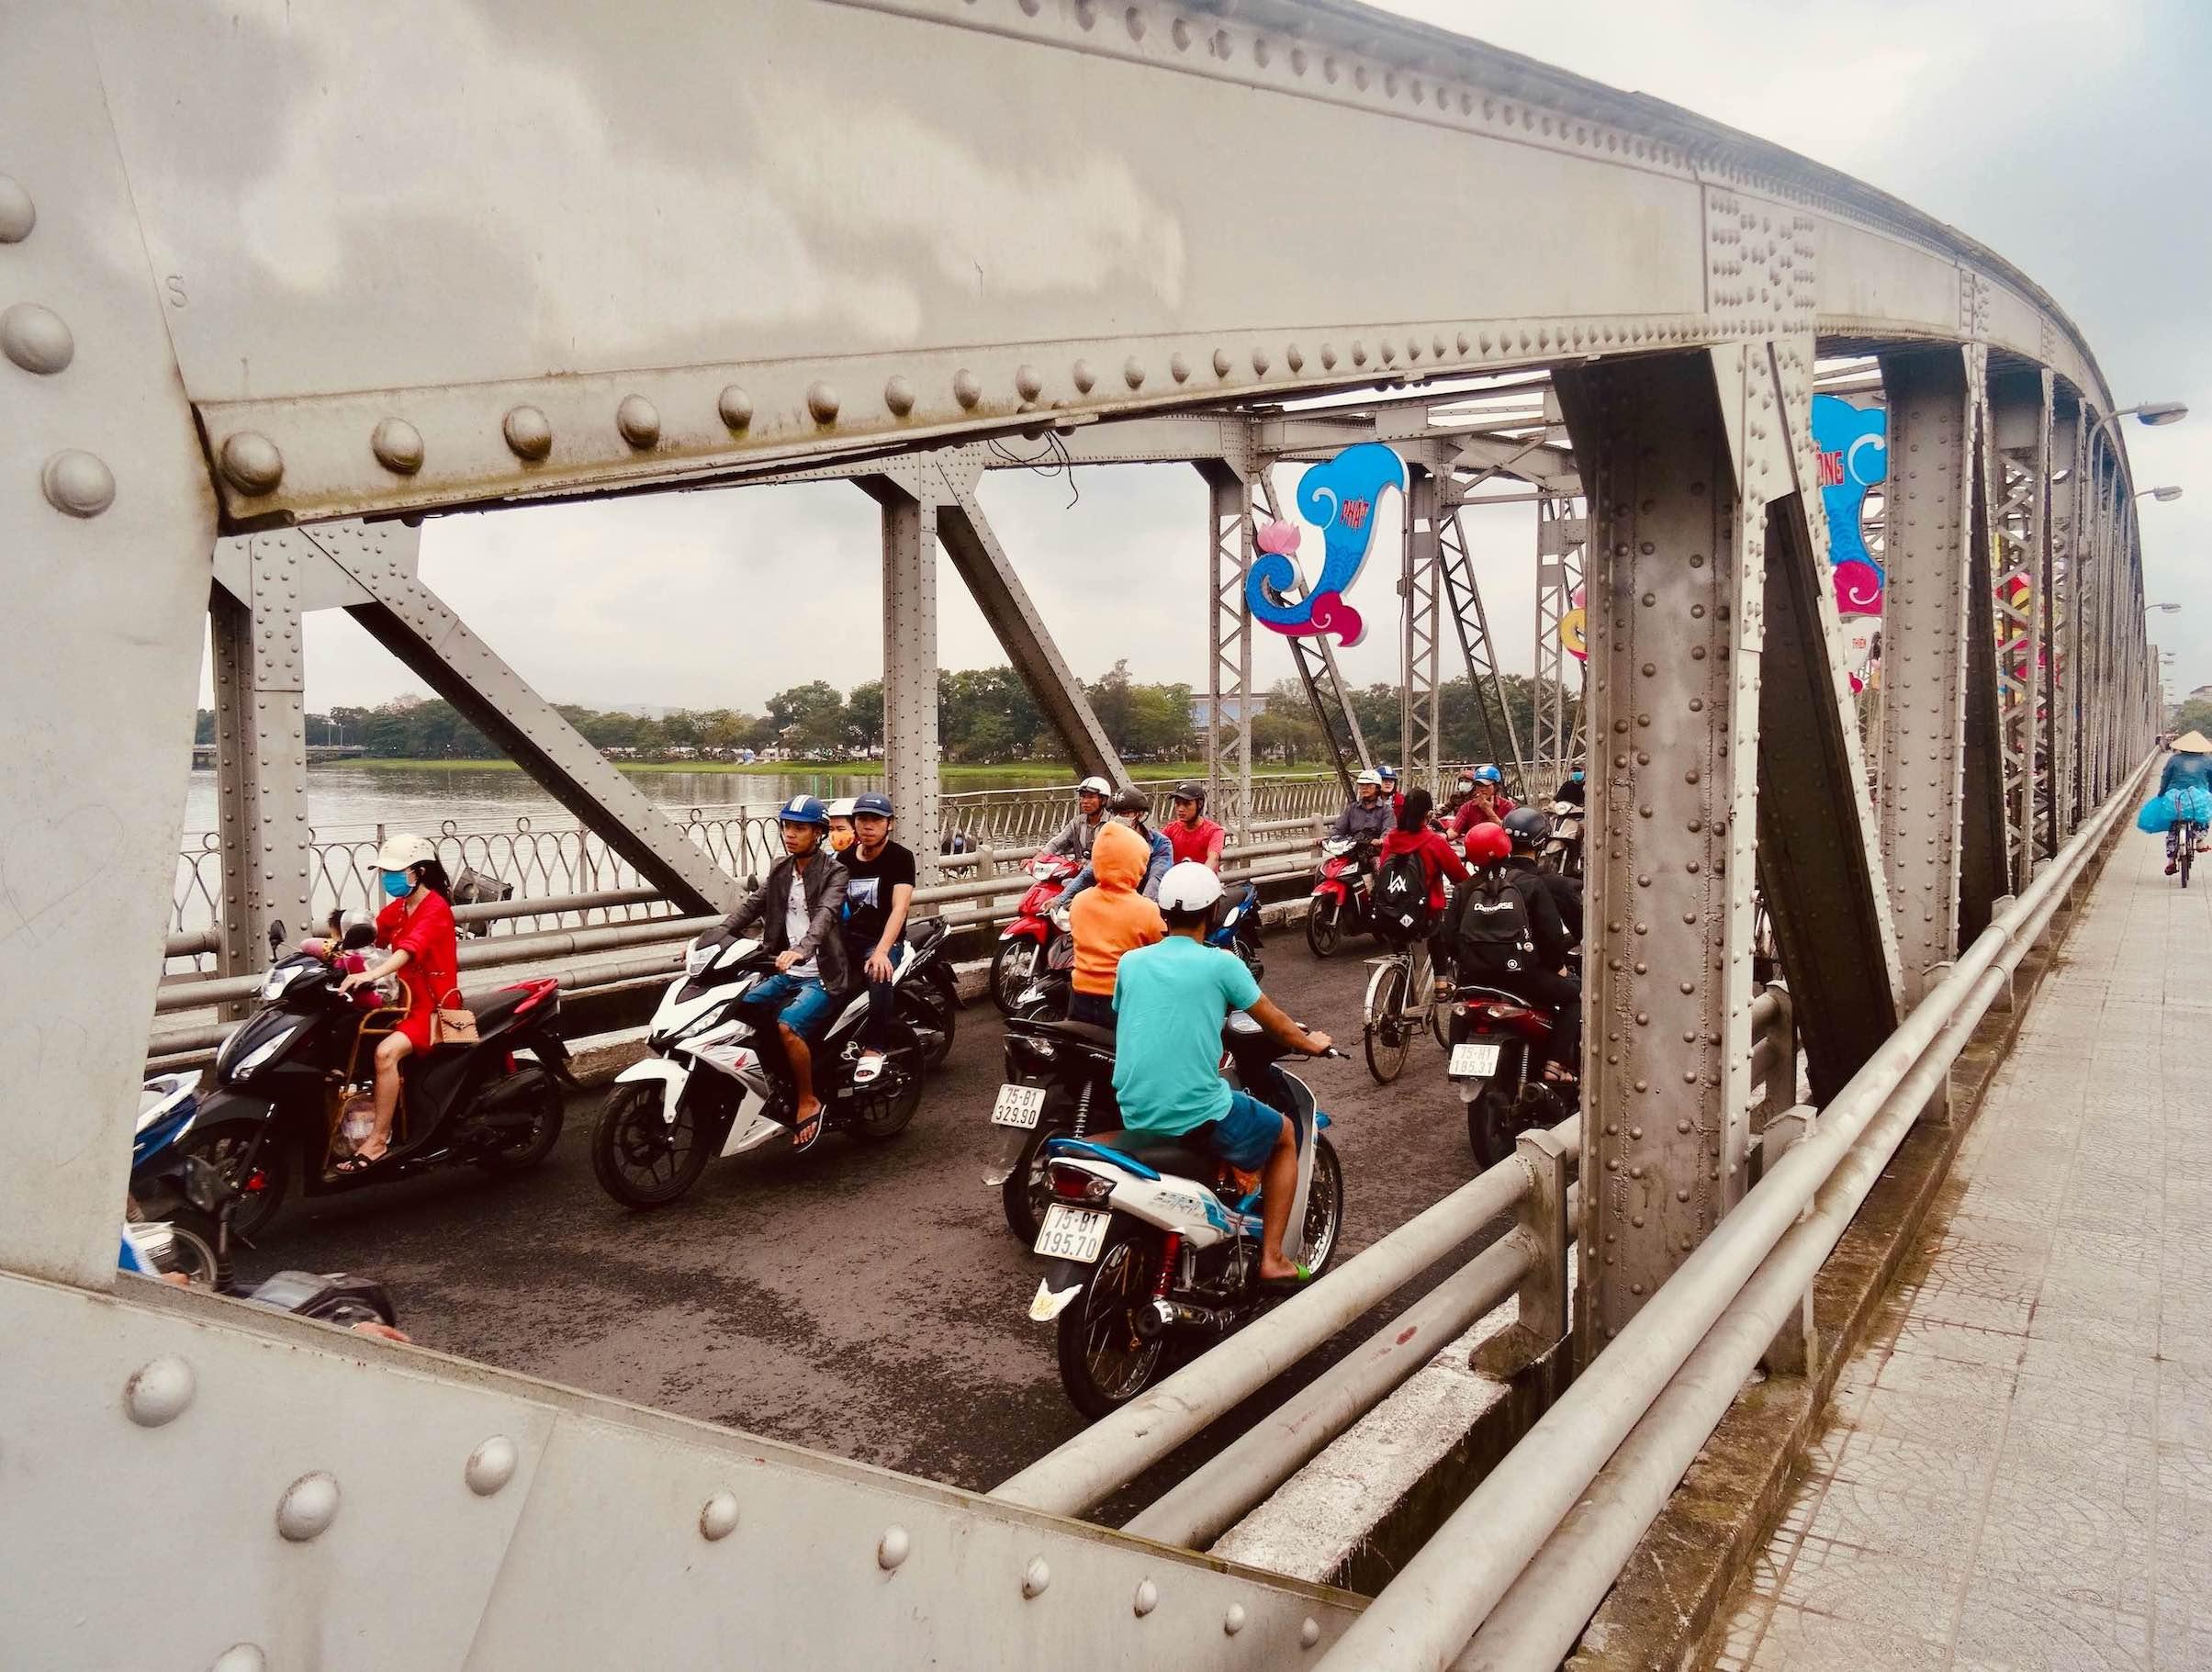 Traffic on the Truong Tien Bridge Hue Vietnam